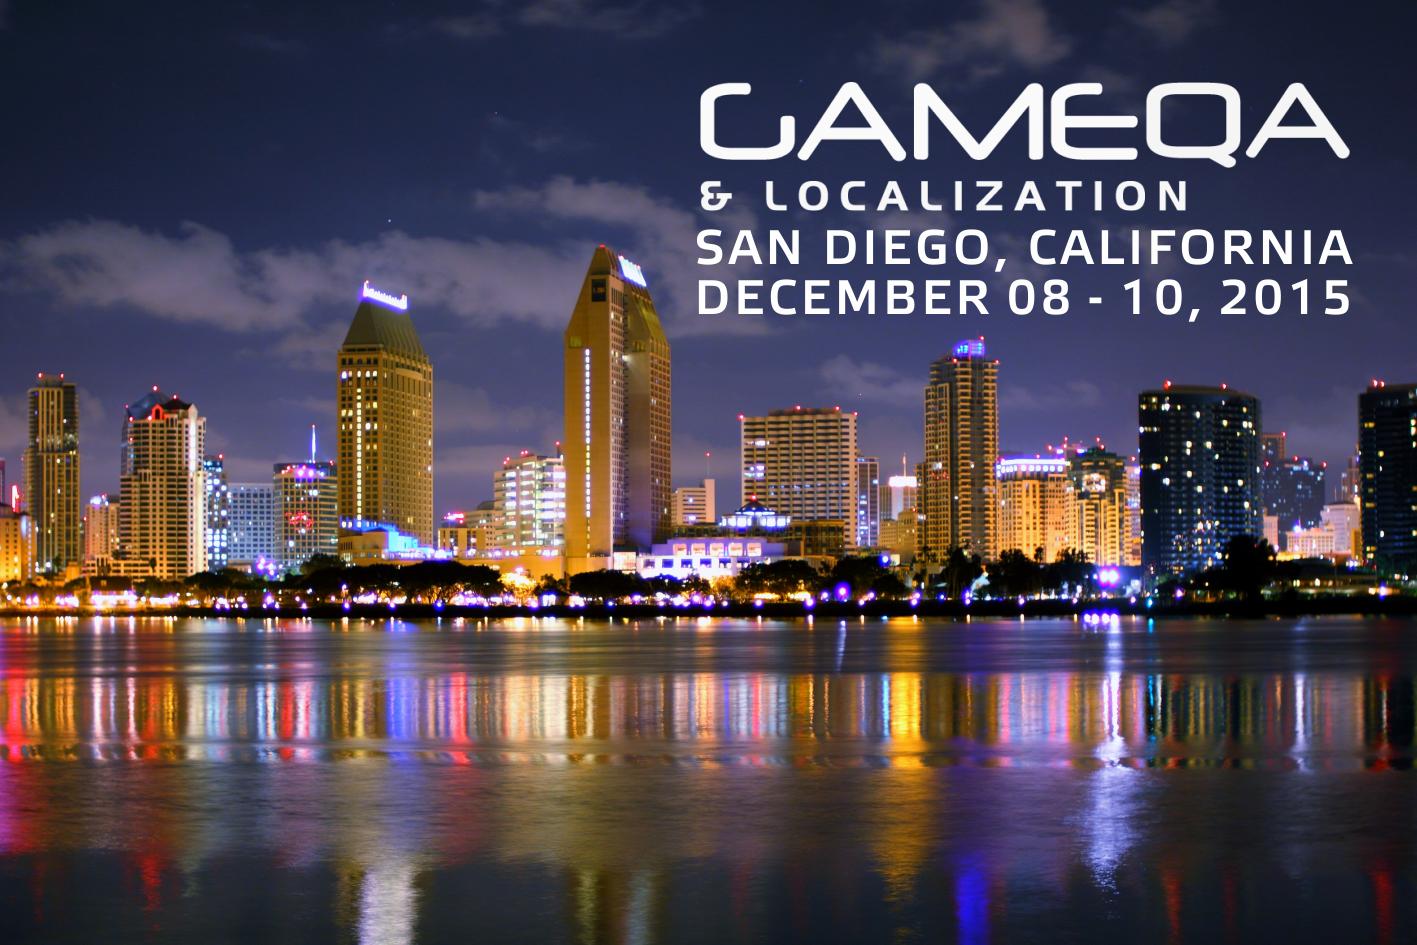 Участие в конференции Game QA & Localization в Сан-Диего